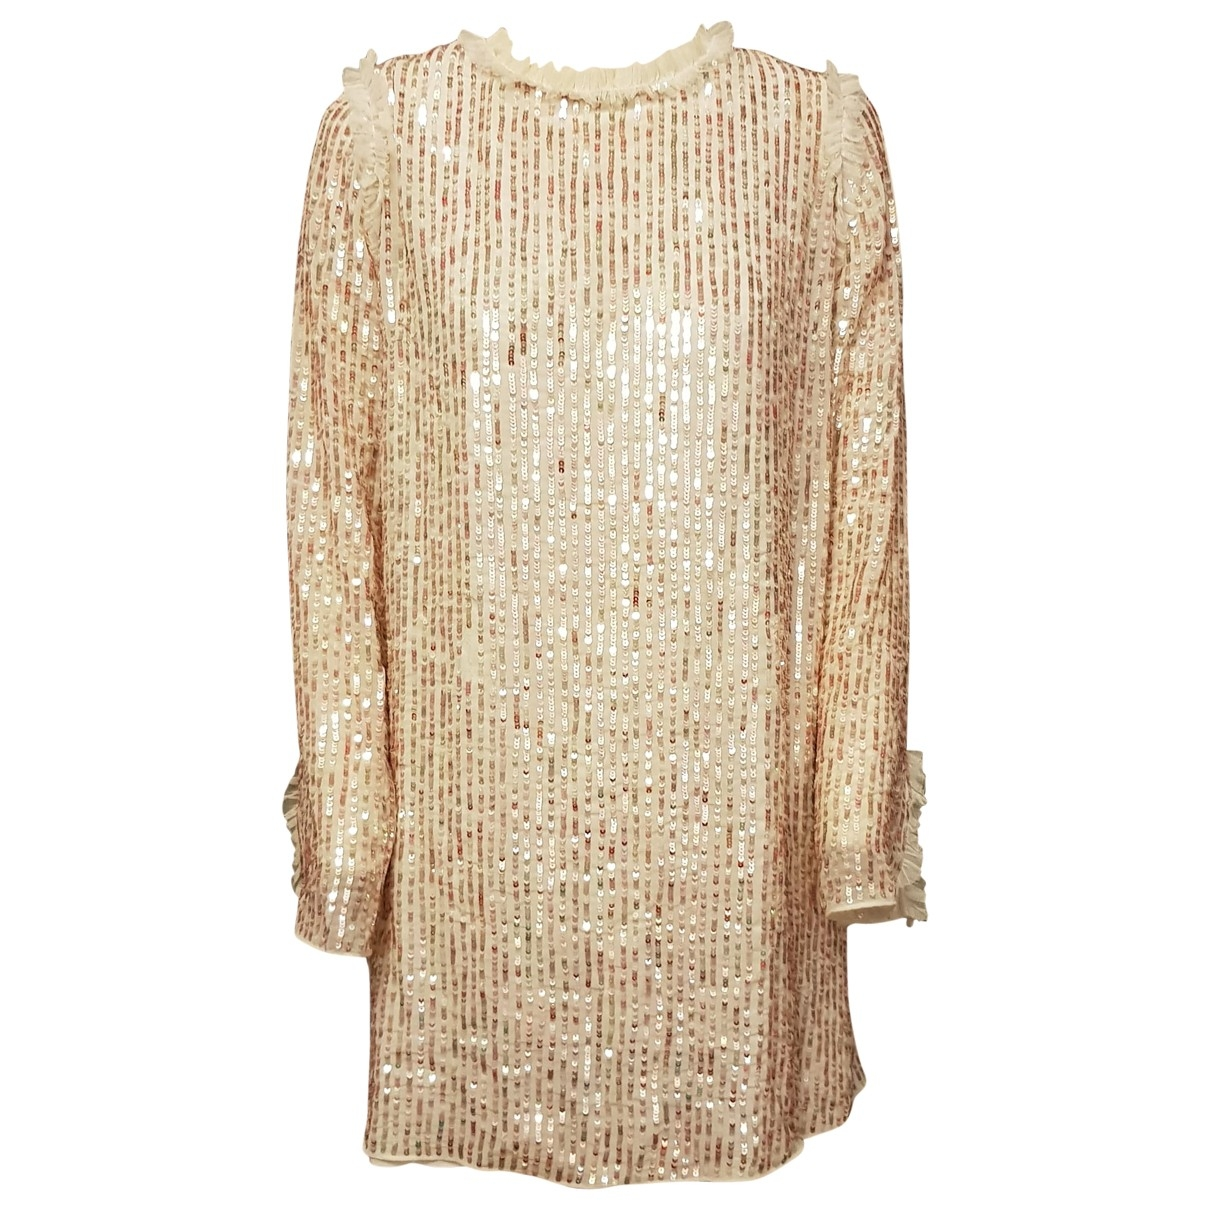 Needle & Thread \N Multicolour dress for Women M International